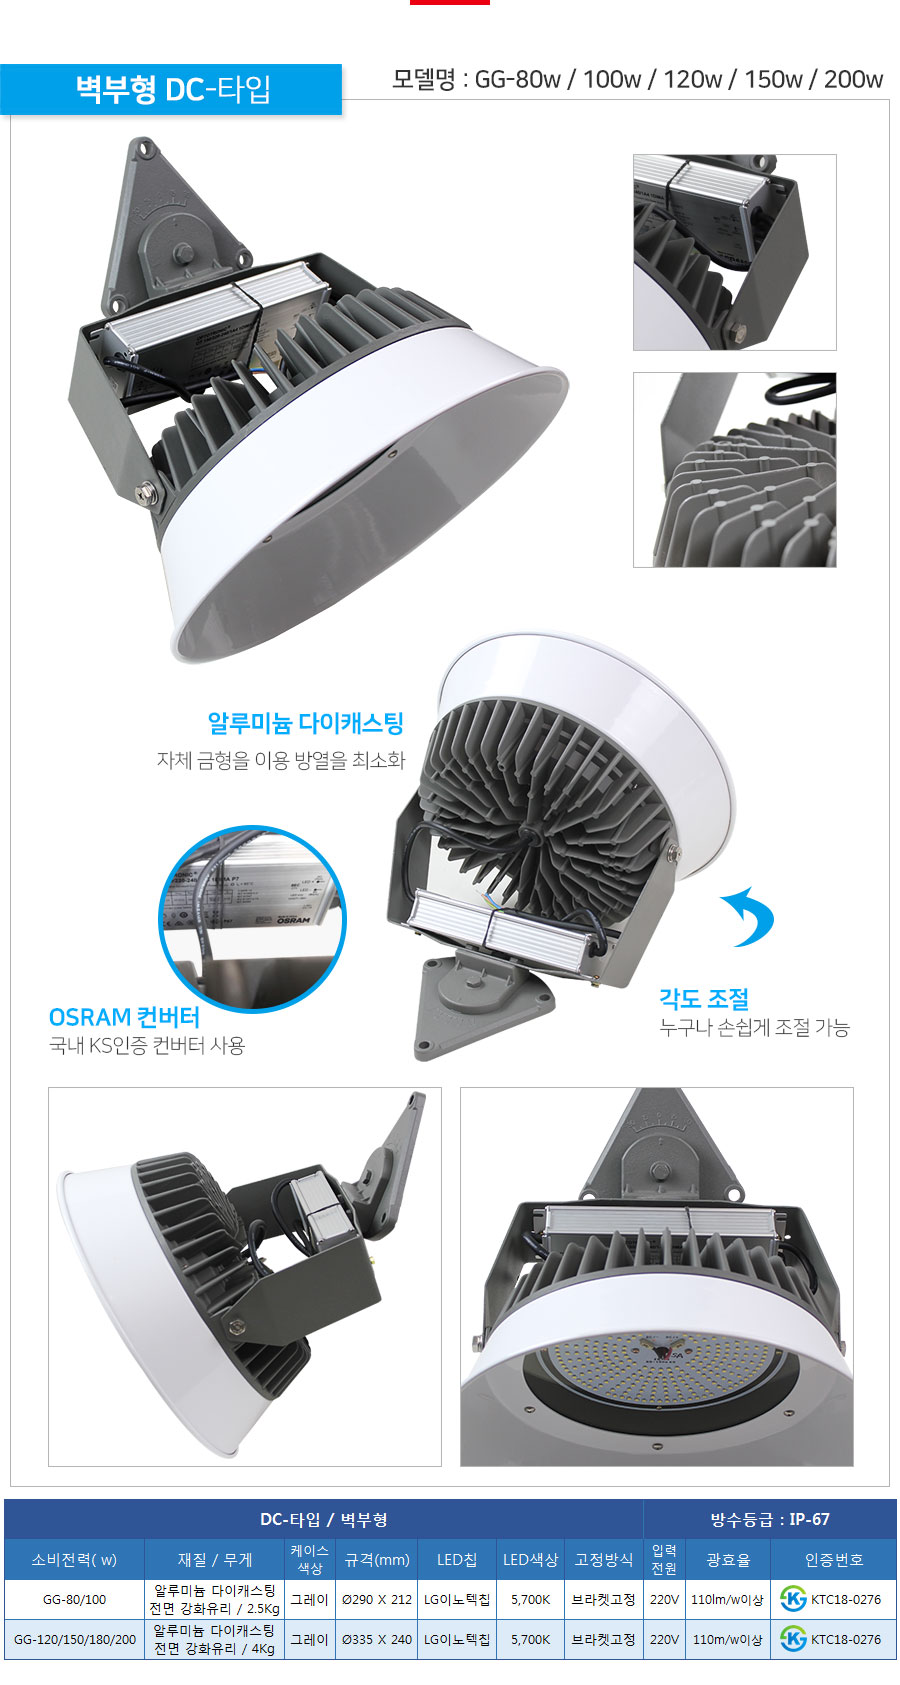 제로조명 LED공장등 80w 100w 120w 150w 180w 200w DC타입